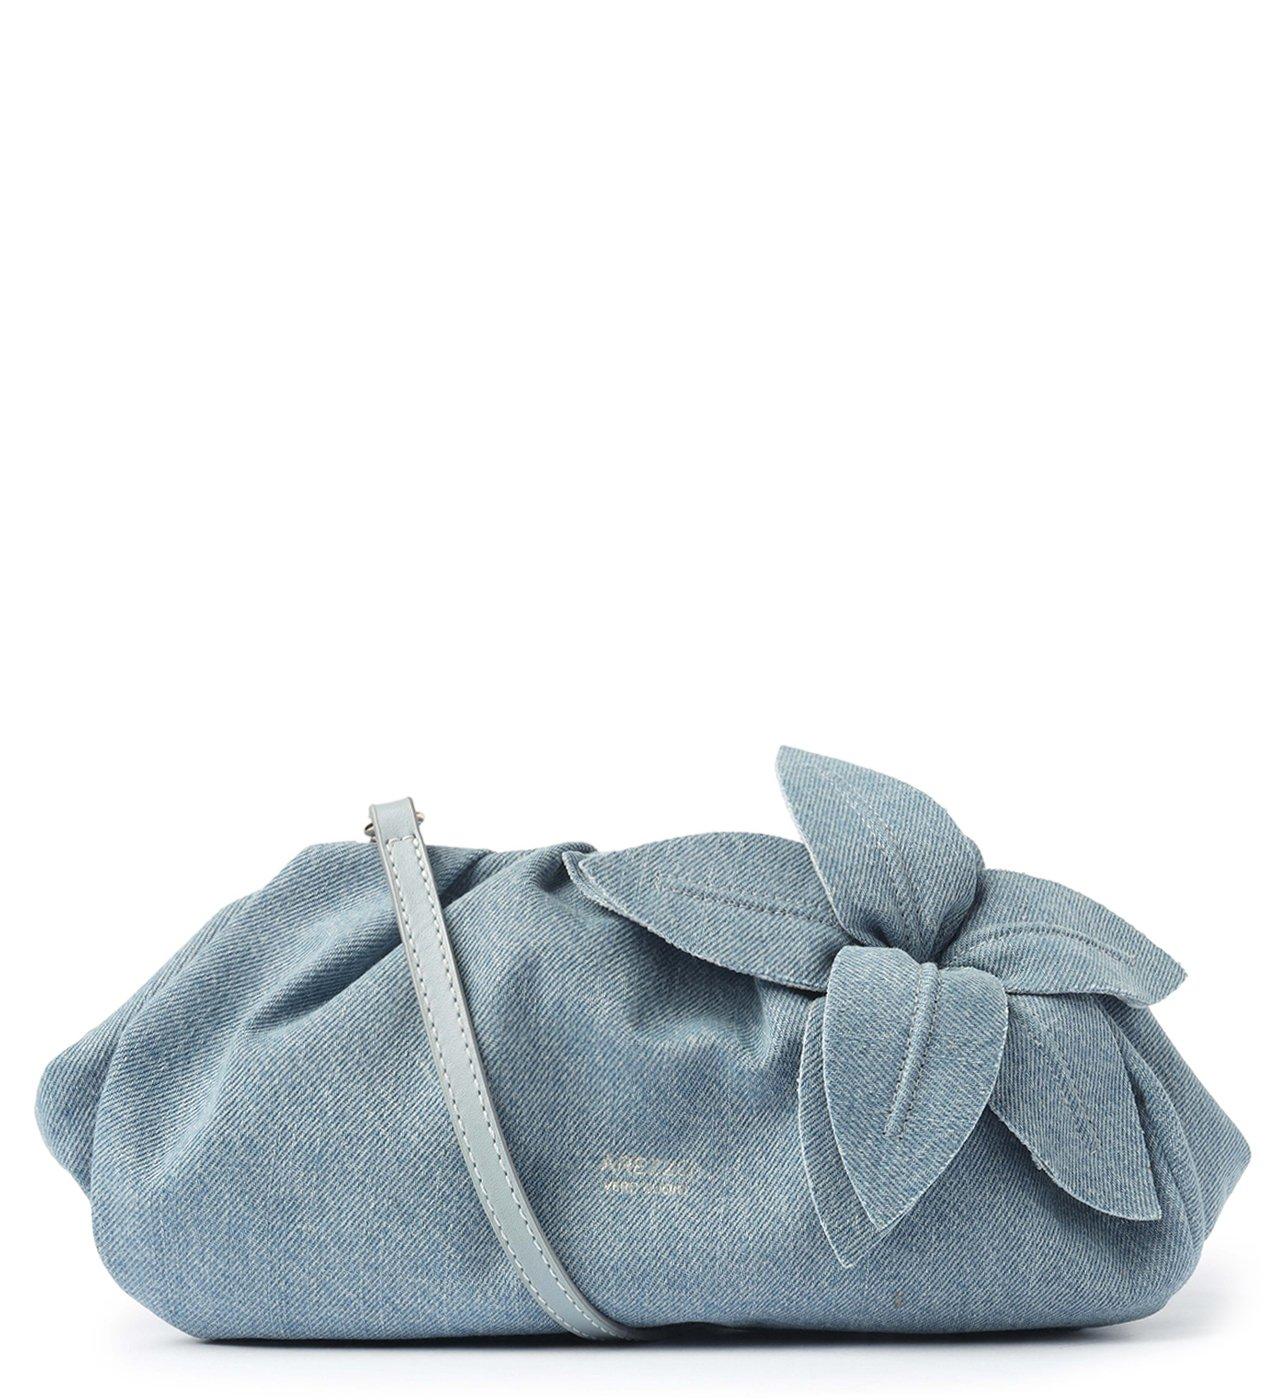 Bolsa Tiracolo Azul Jeans Couro Lily Média | Arezzo